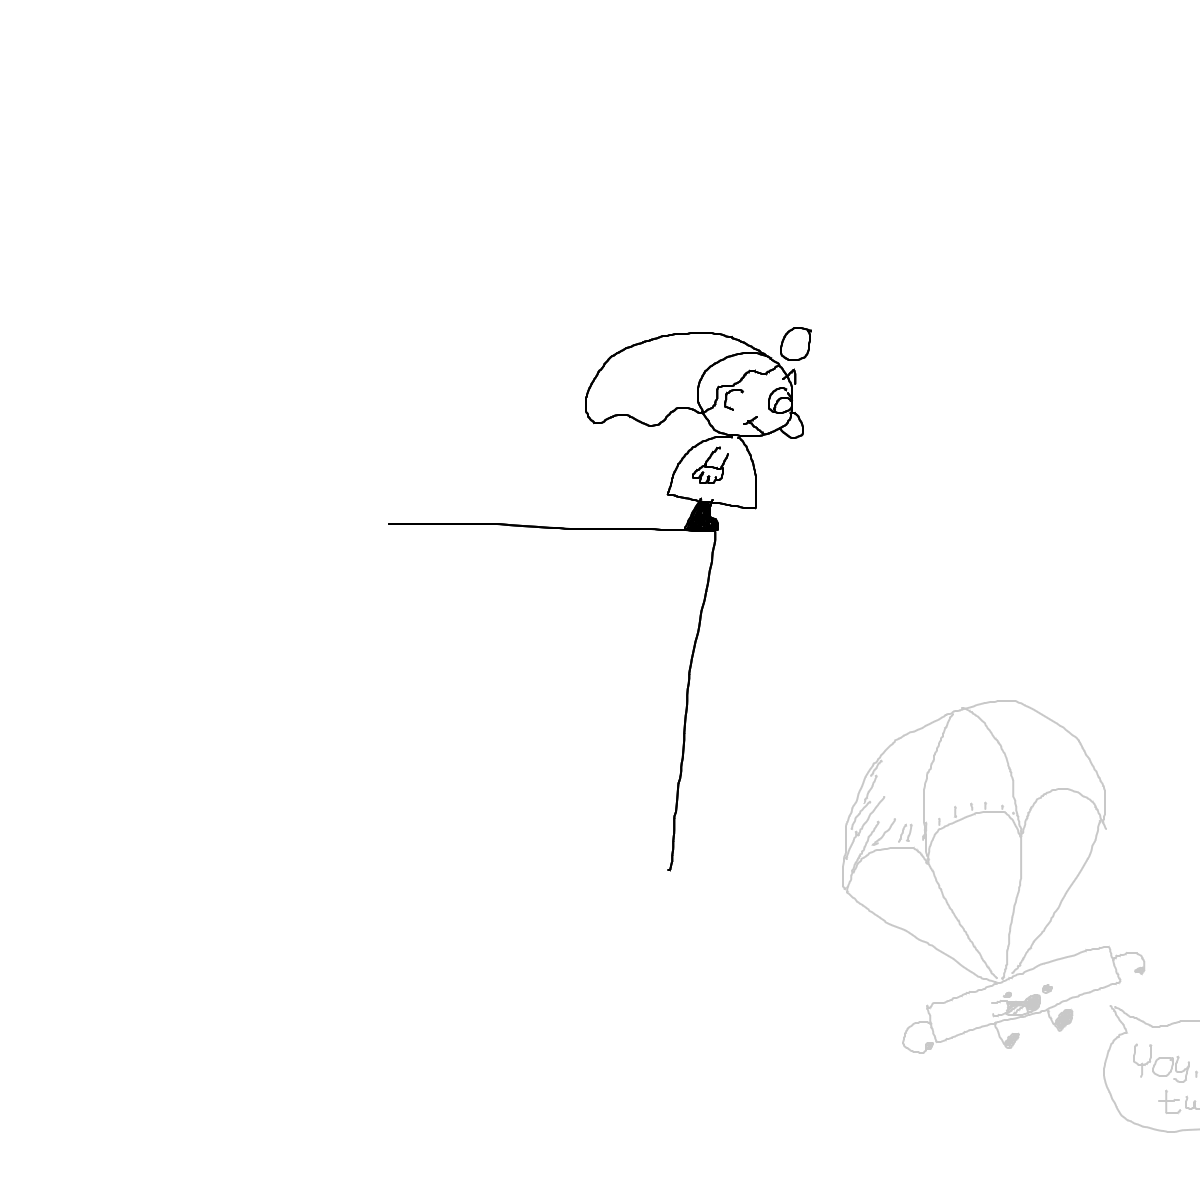 BAAAM drawing#24328 lat:78.4204101562500000lng: -4.4845685958862305